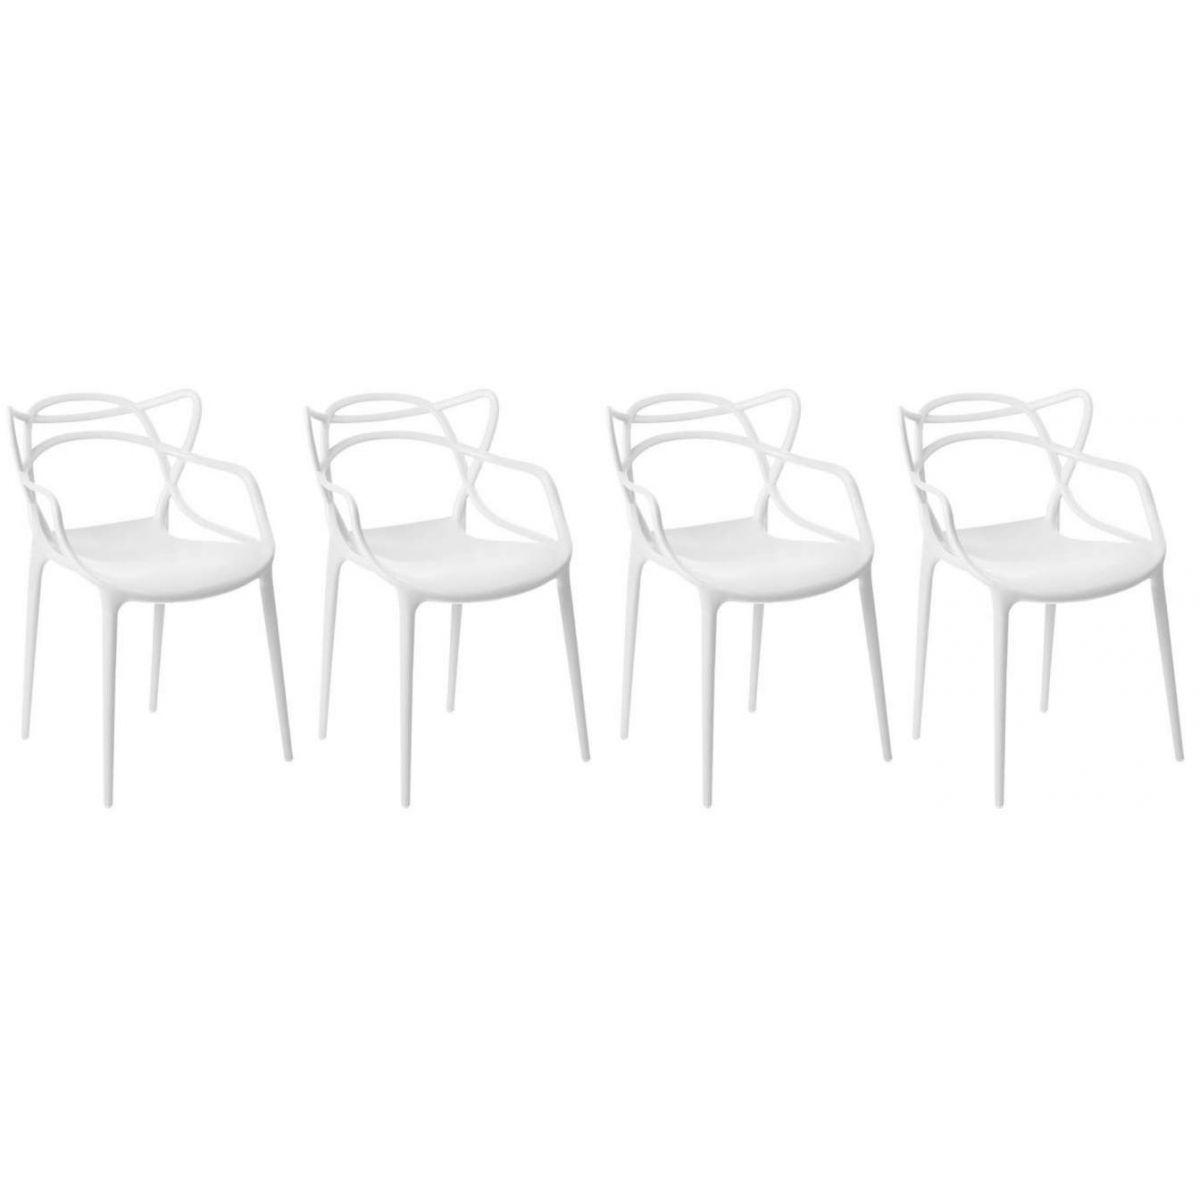 Kit 4 Cadeiras Design Allegra Pelegrin PEL-1737 Cor Branca